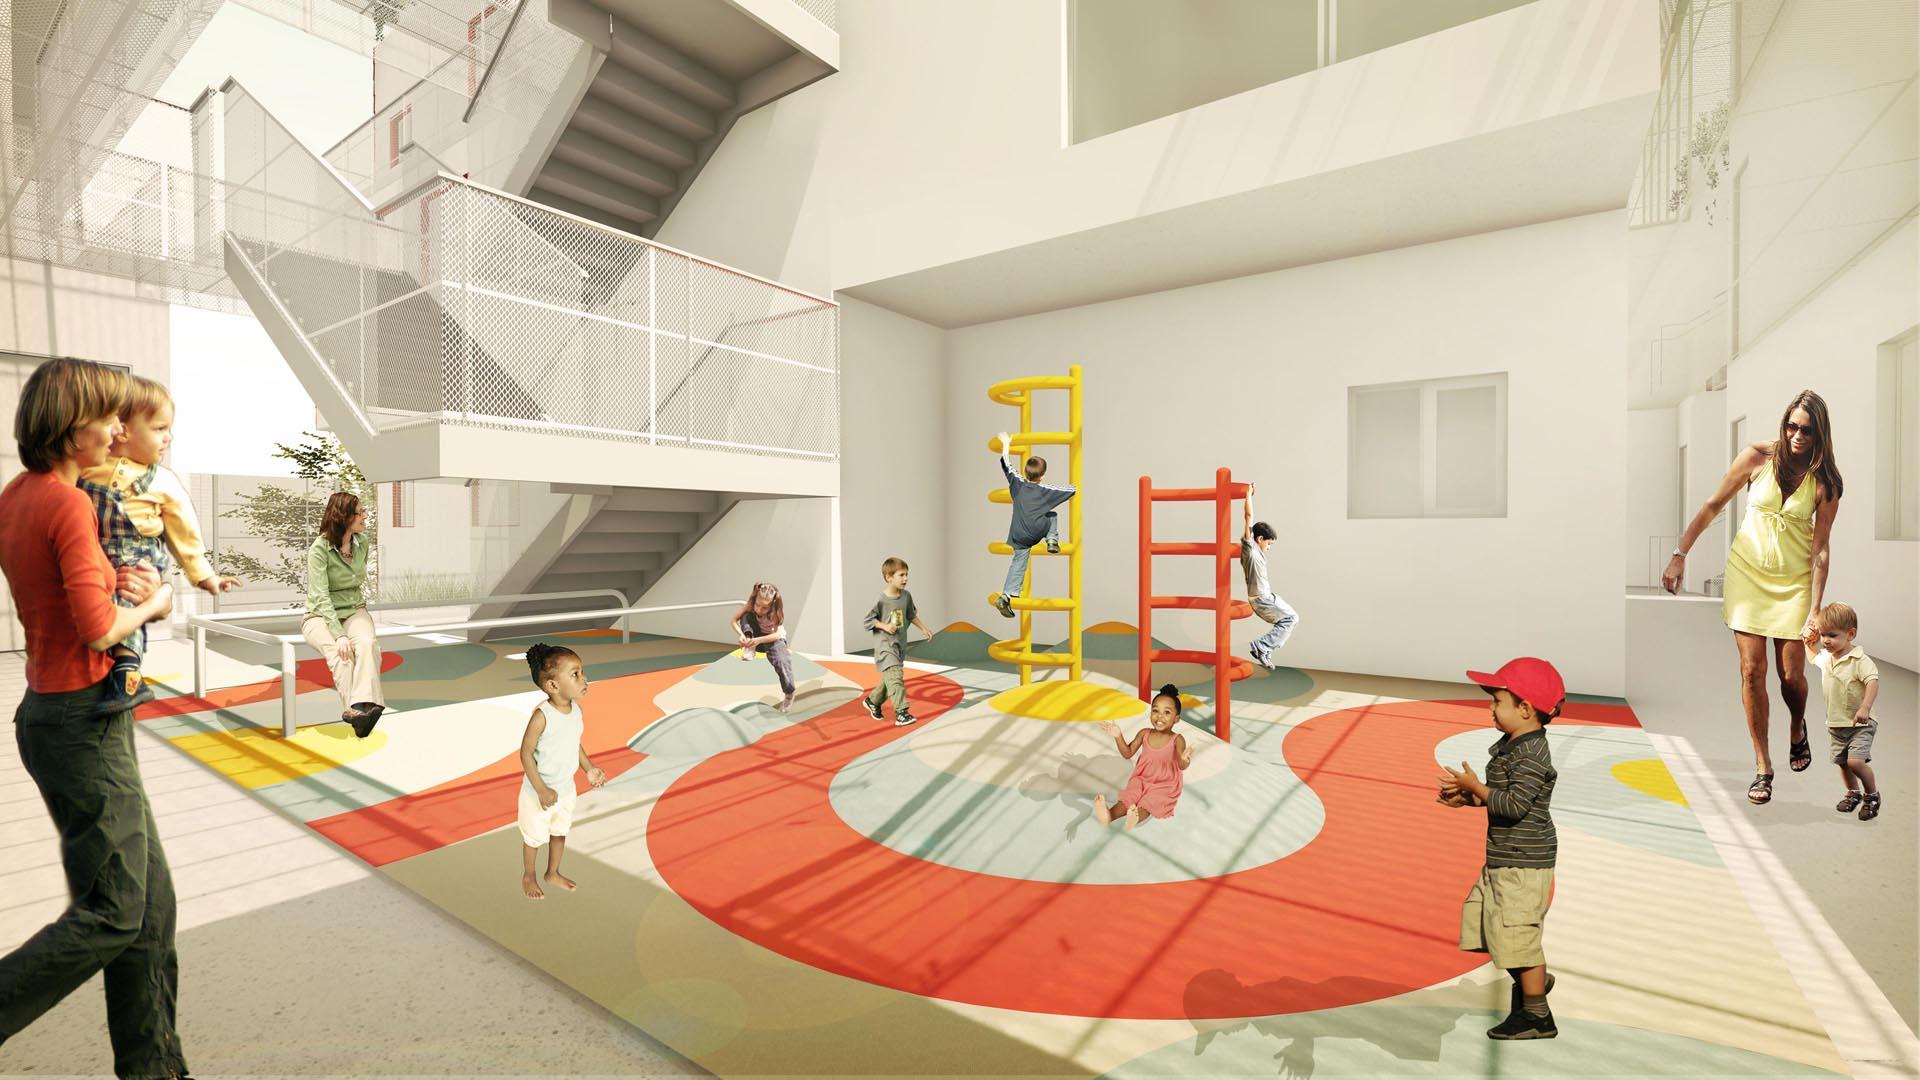 TINA CHEE landscape studio-SUNKING-playground 1.jpg